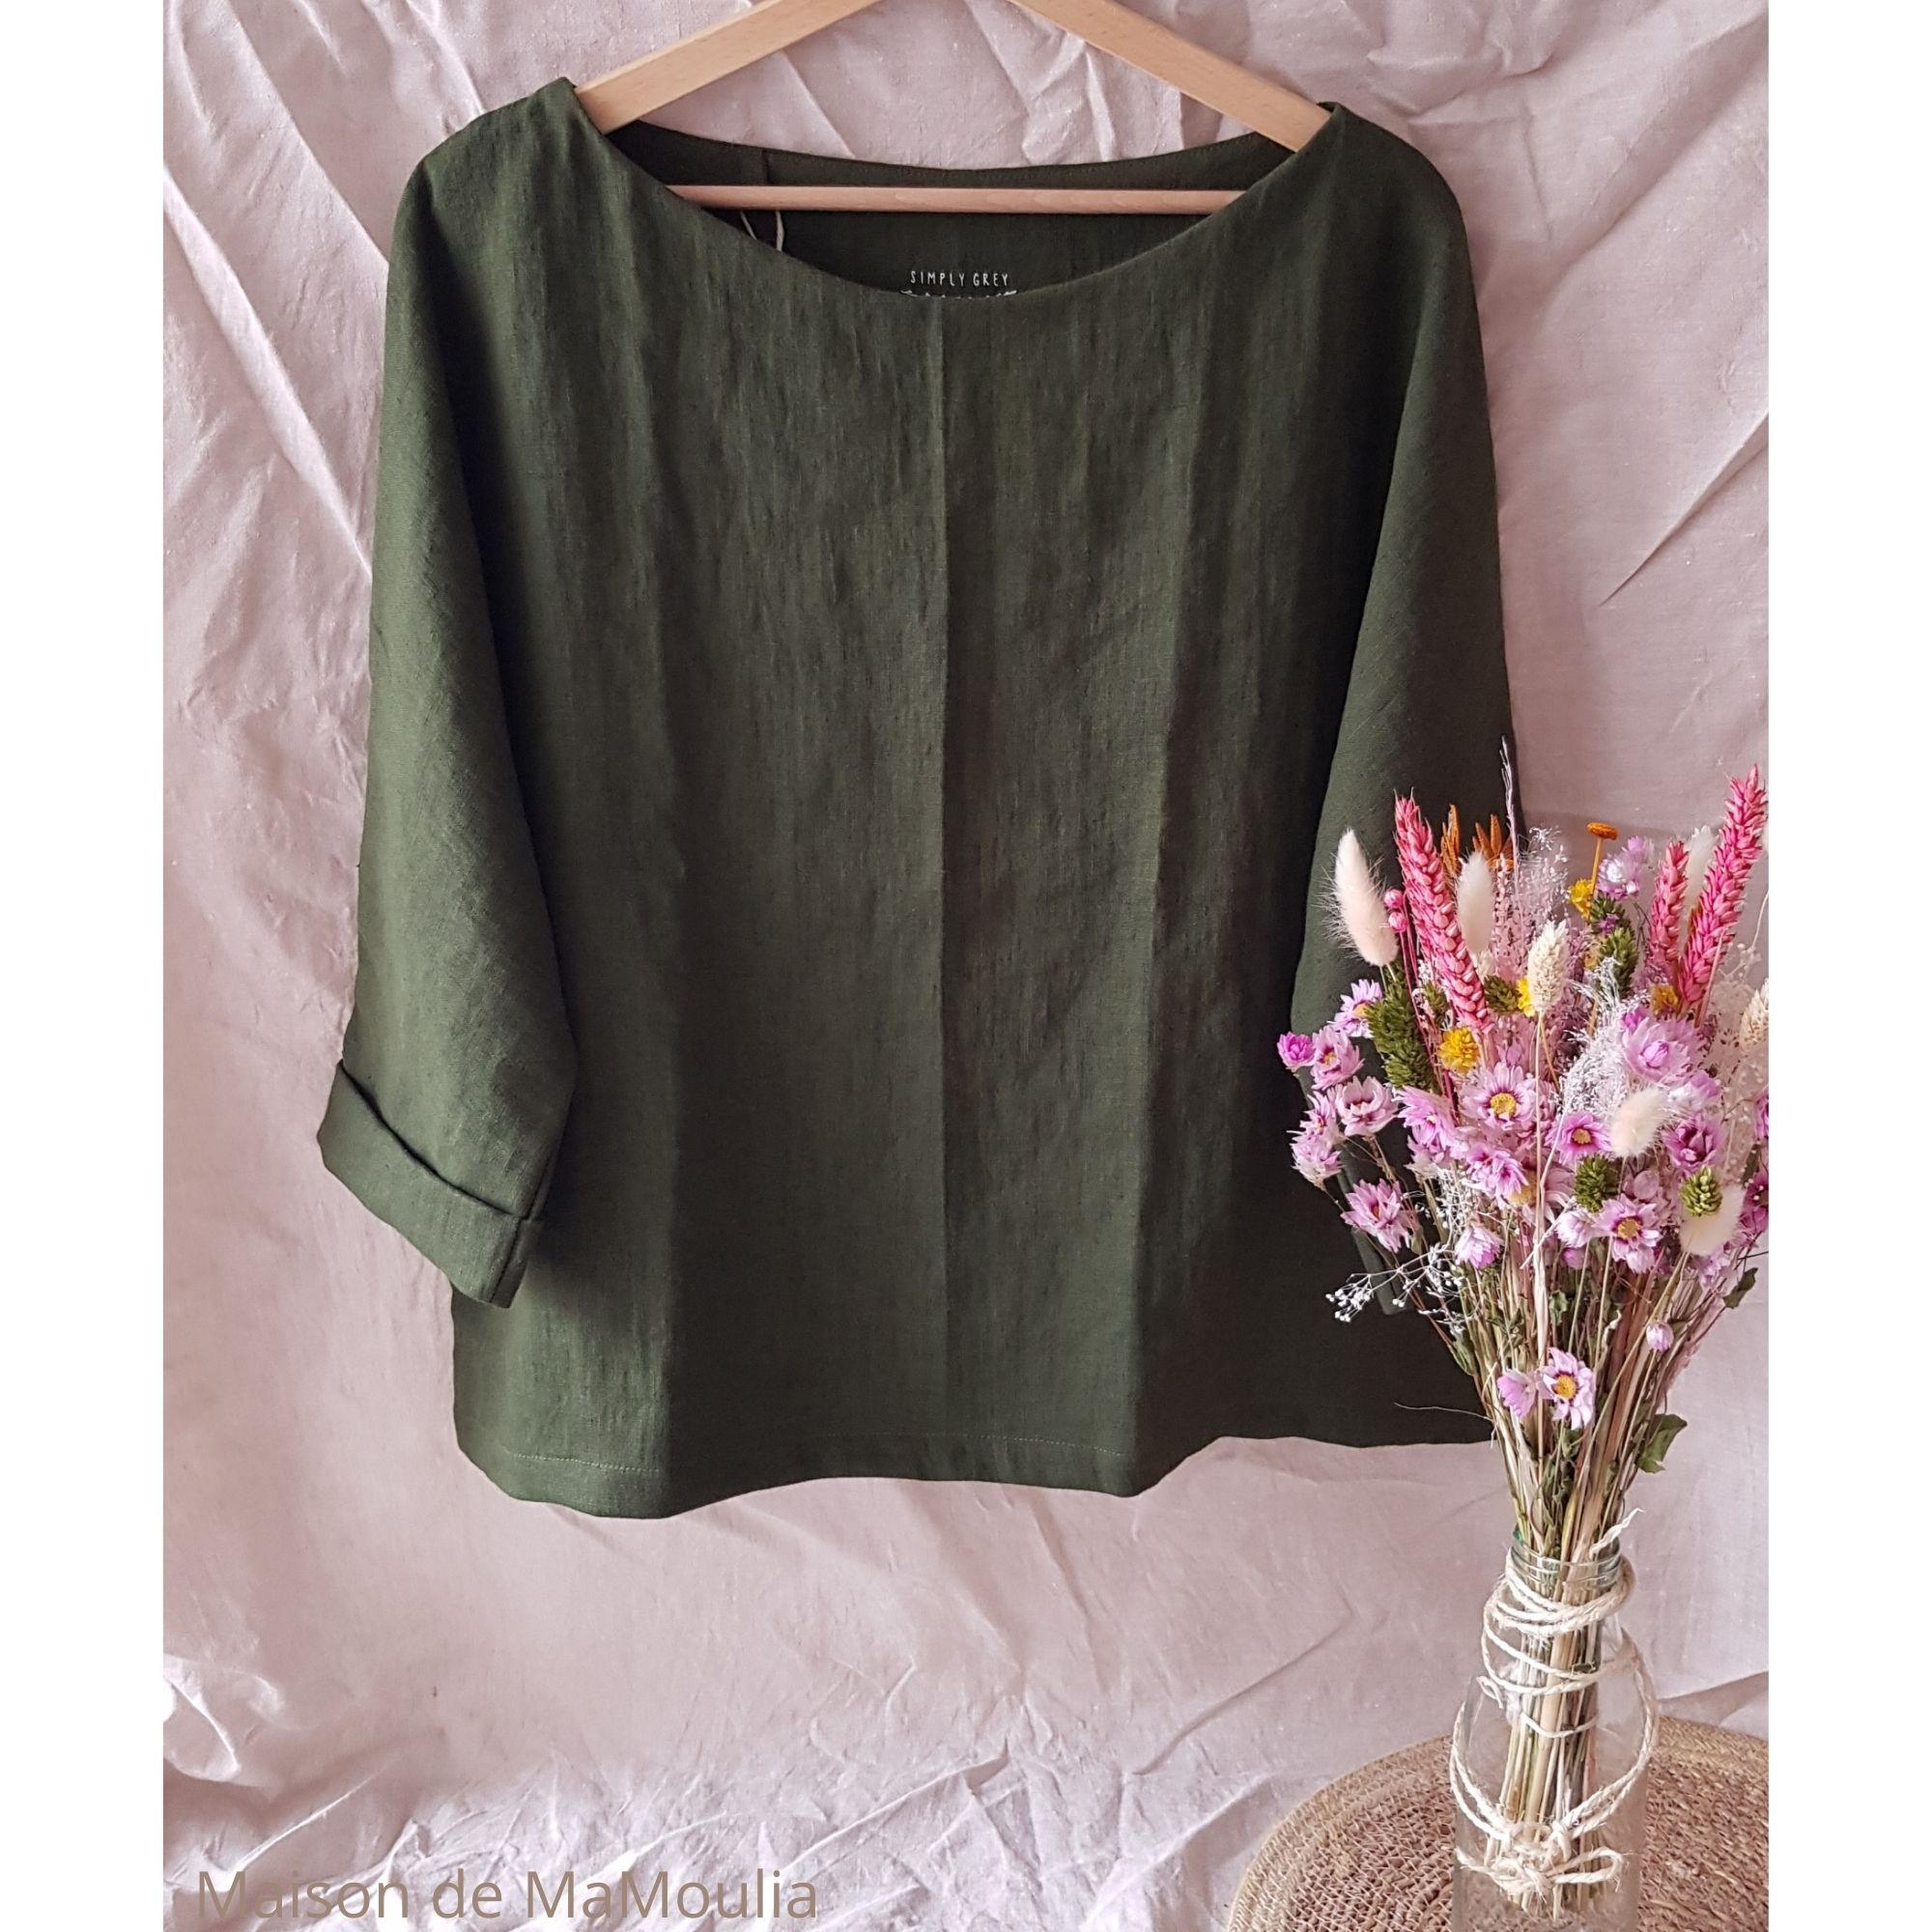 SIMPLY GREY - Blouse oversize - 100% lin lavé - Vert foret